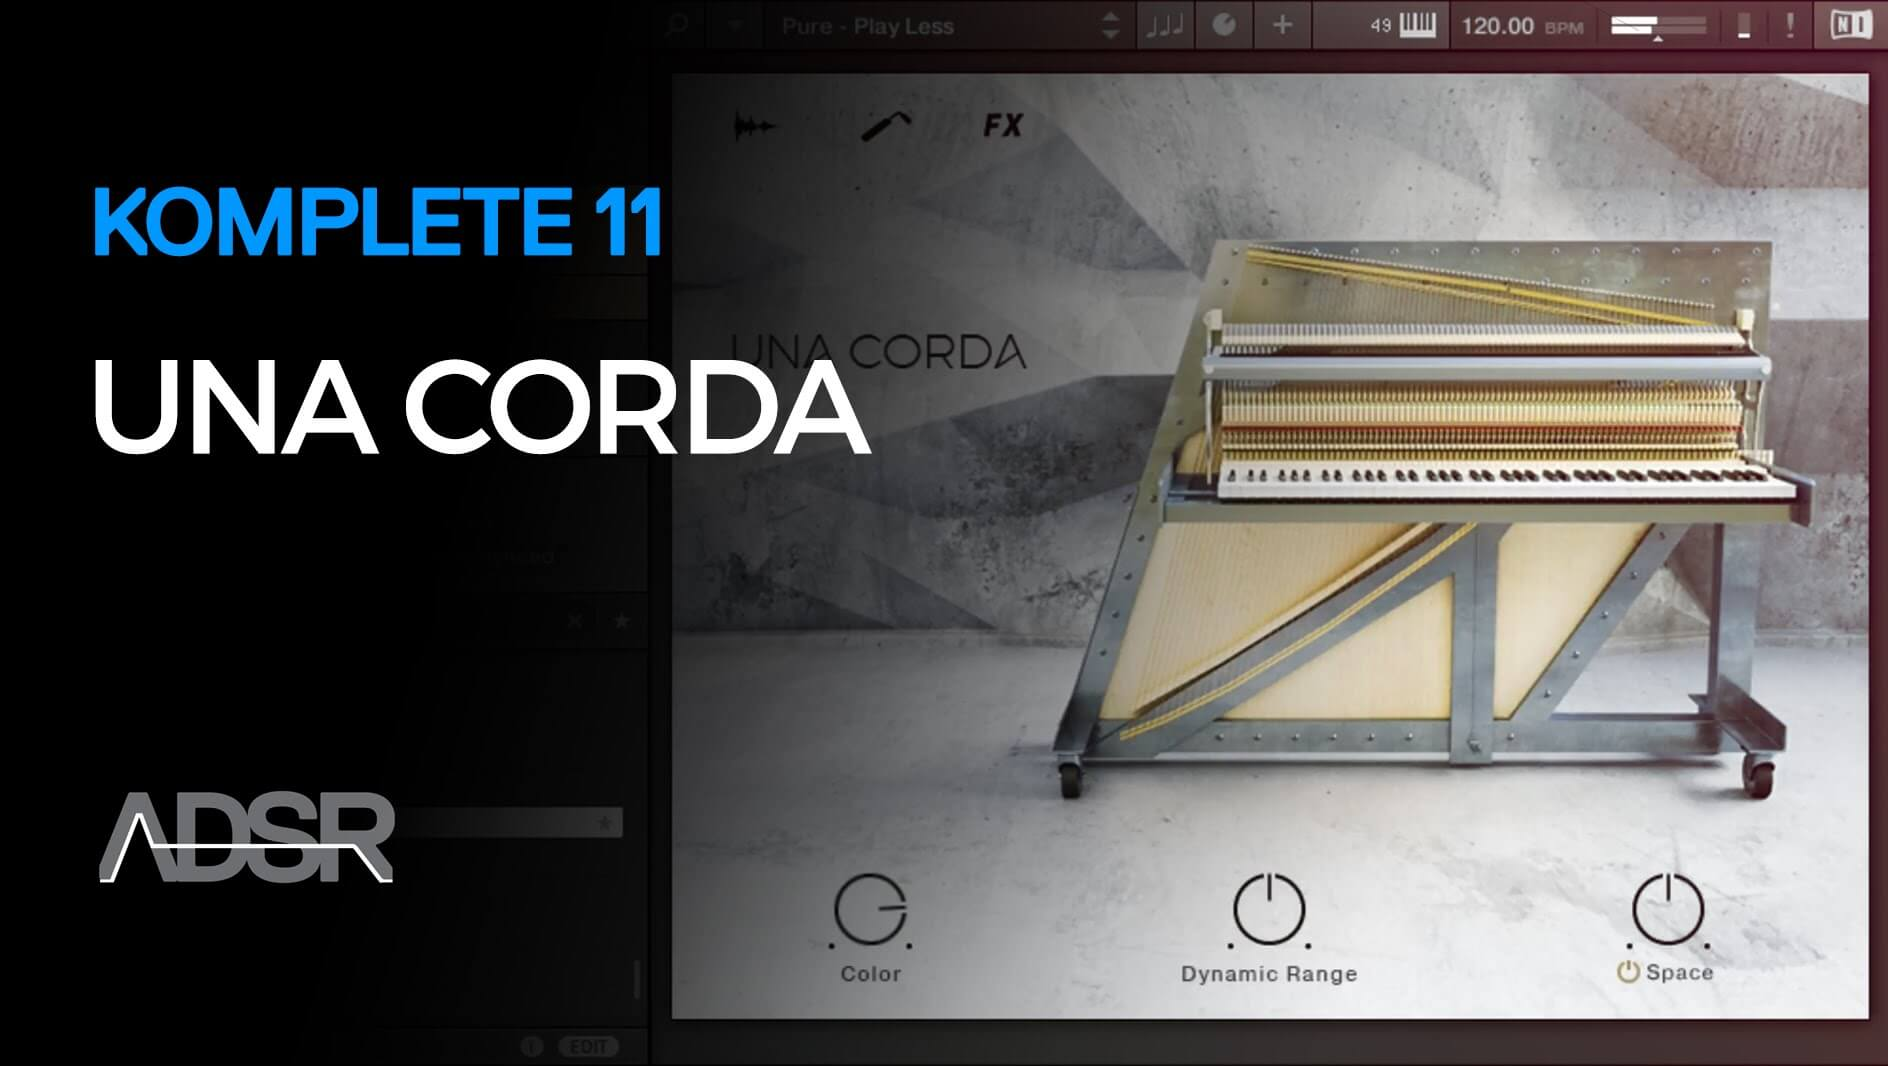 Una Corda - Komplete 11